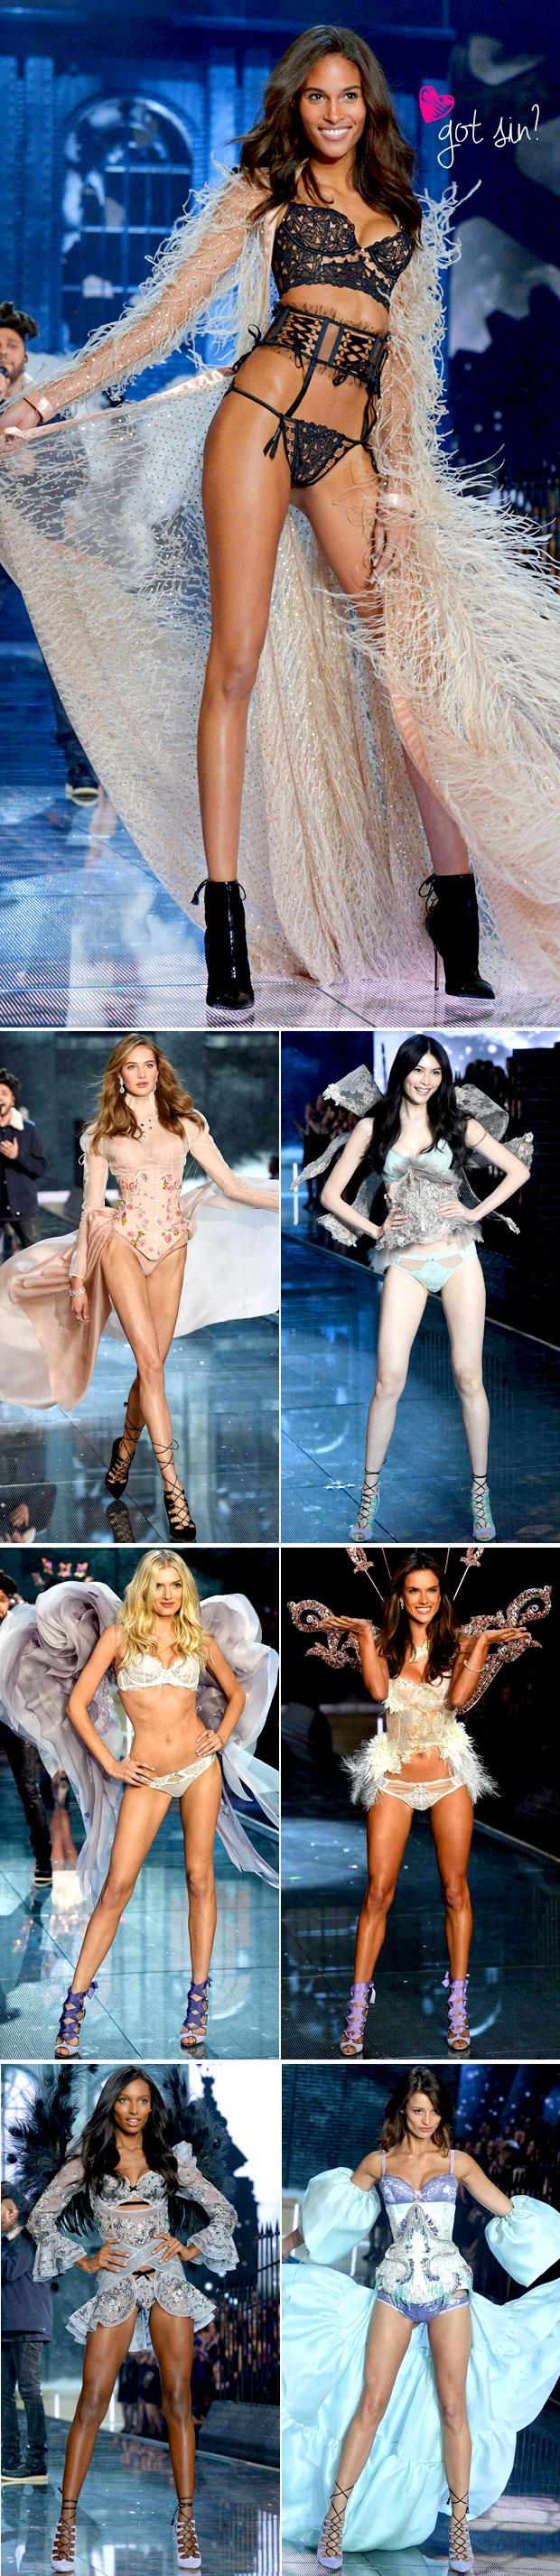 victorias-secret-fashion-show-todas-as-fotos-blog-got-sin-victorian-carnival-cindy-bruna-alessandra-ambrosio